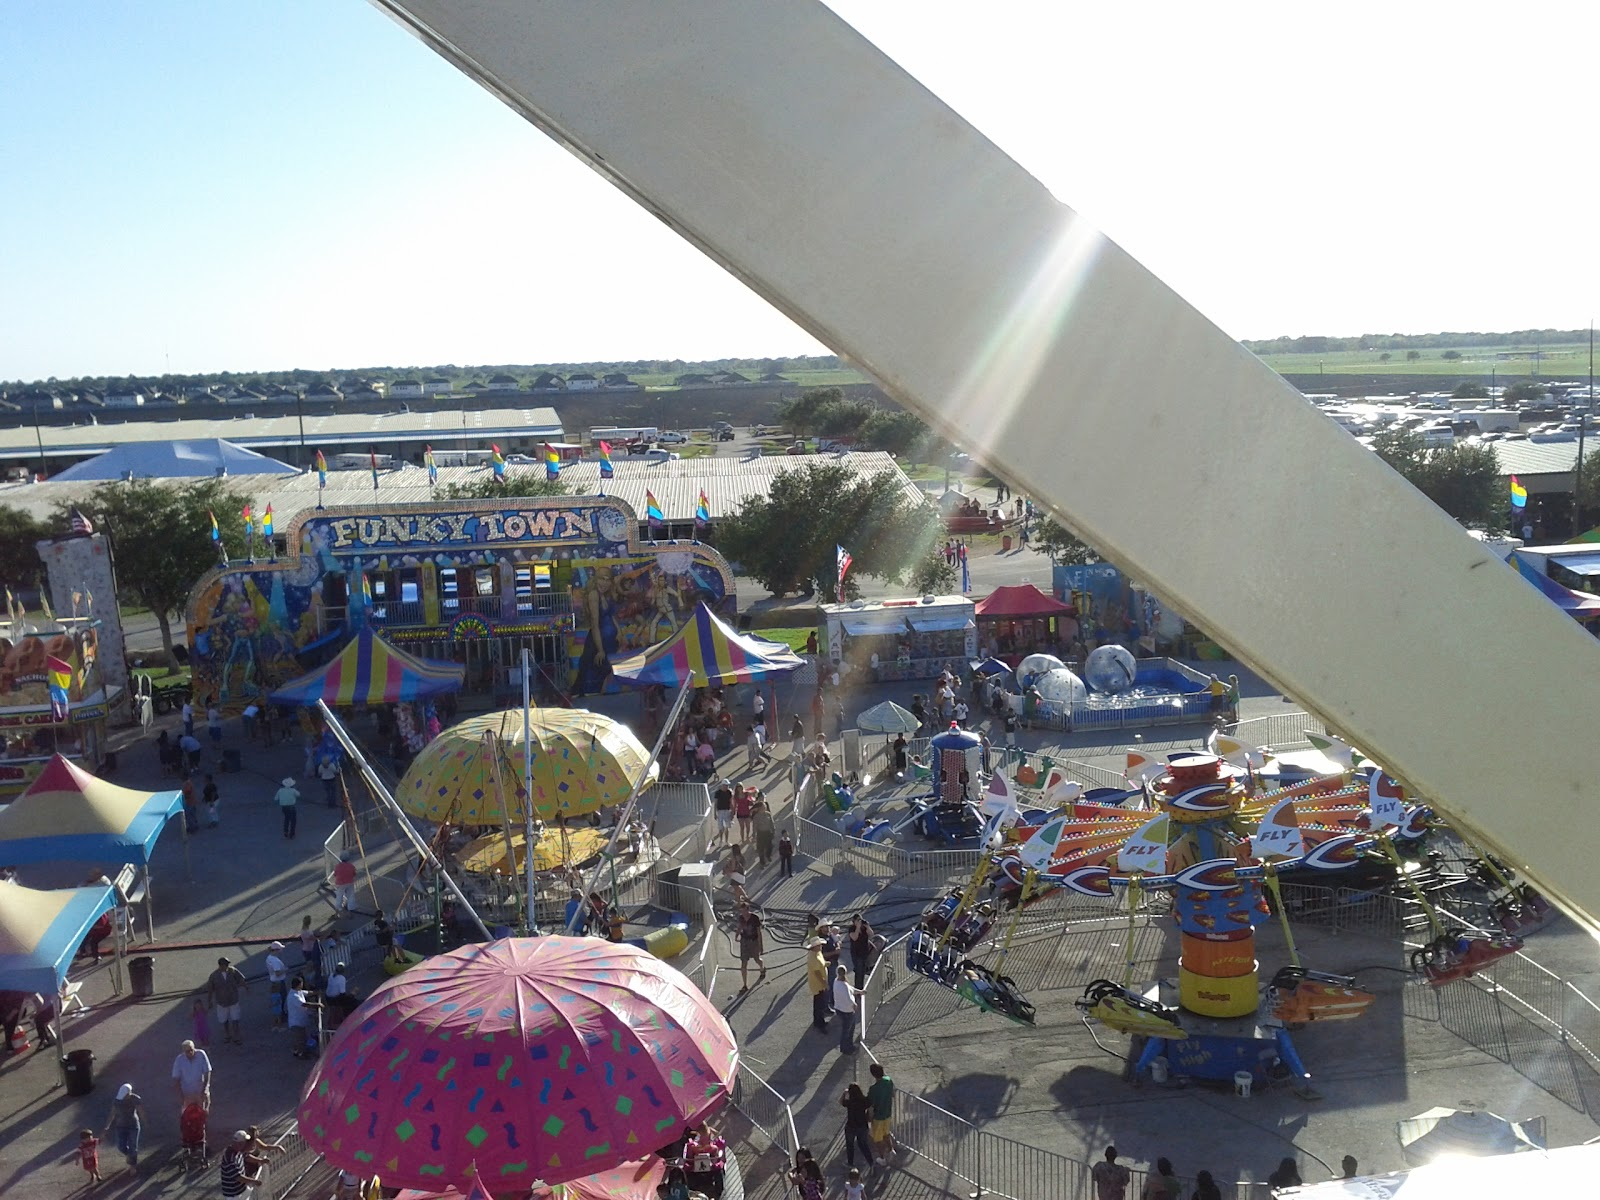 Fort Bend County Fair 2011 - IMG_20111001_174742.jpg